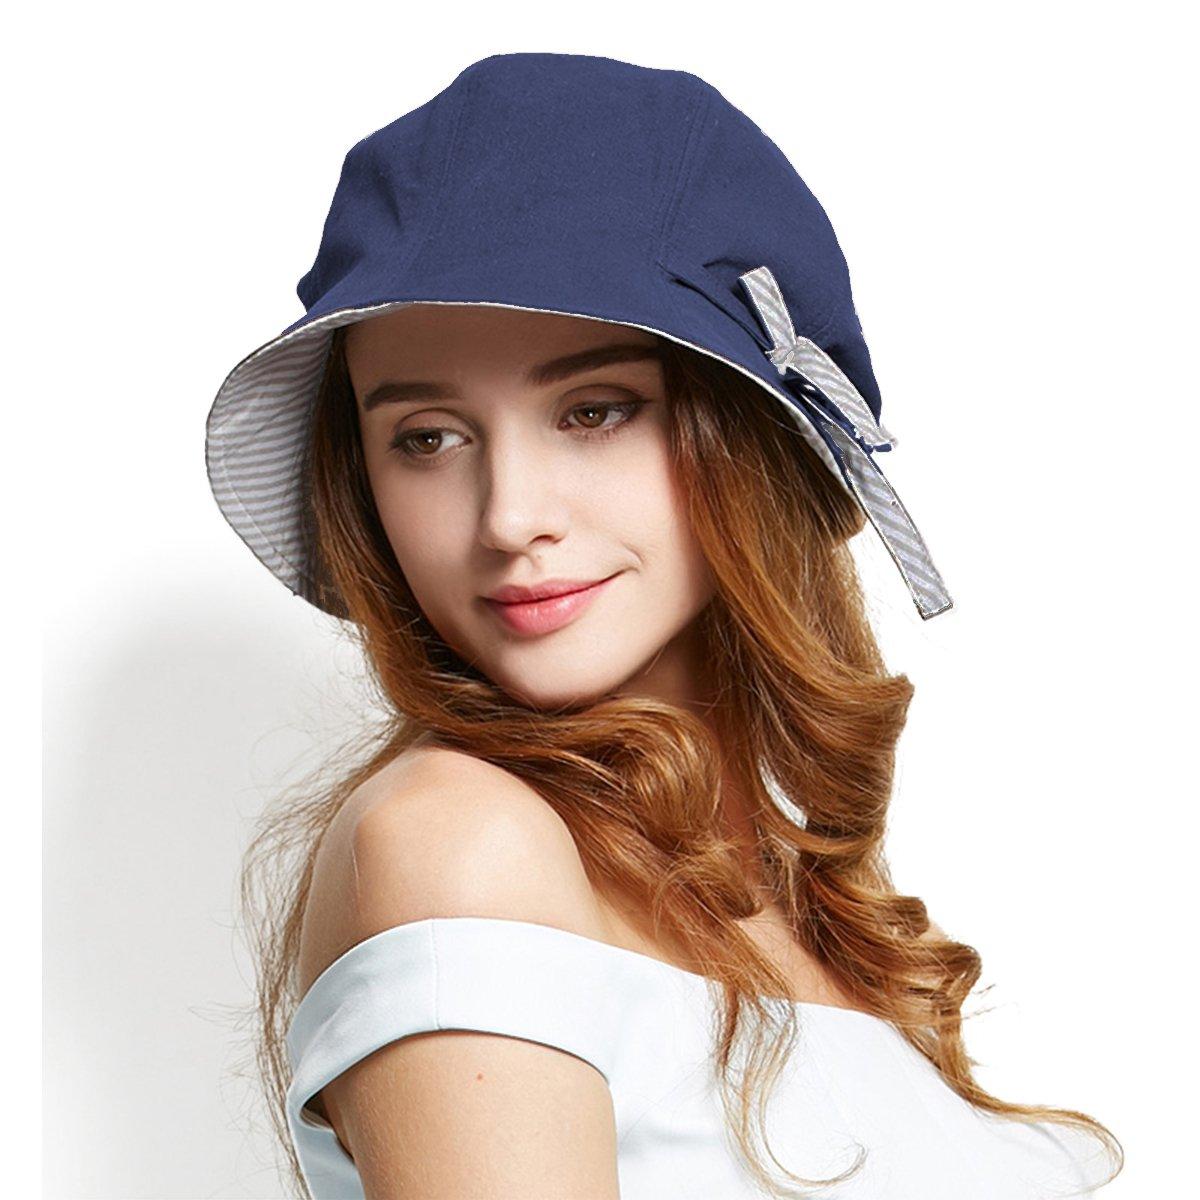 e91e692f Amazon.com: Afala Women Packable Beach Summer Hats Bucket Hats Cloche Hats,  Lightweight Foldable for Travel Vacation (Blue): Sports & Outdoors